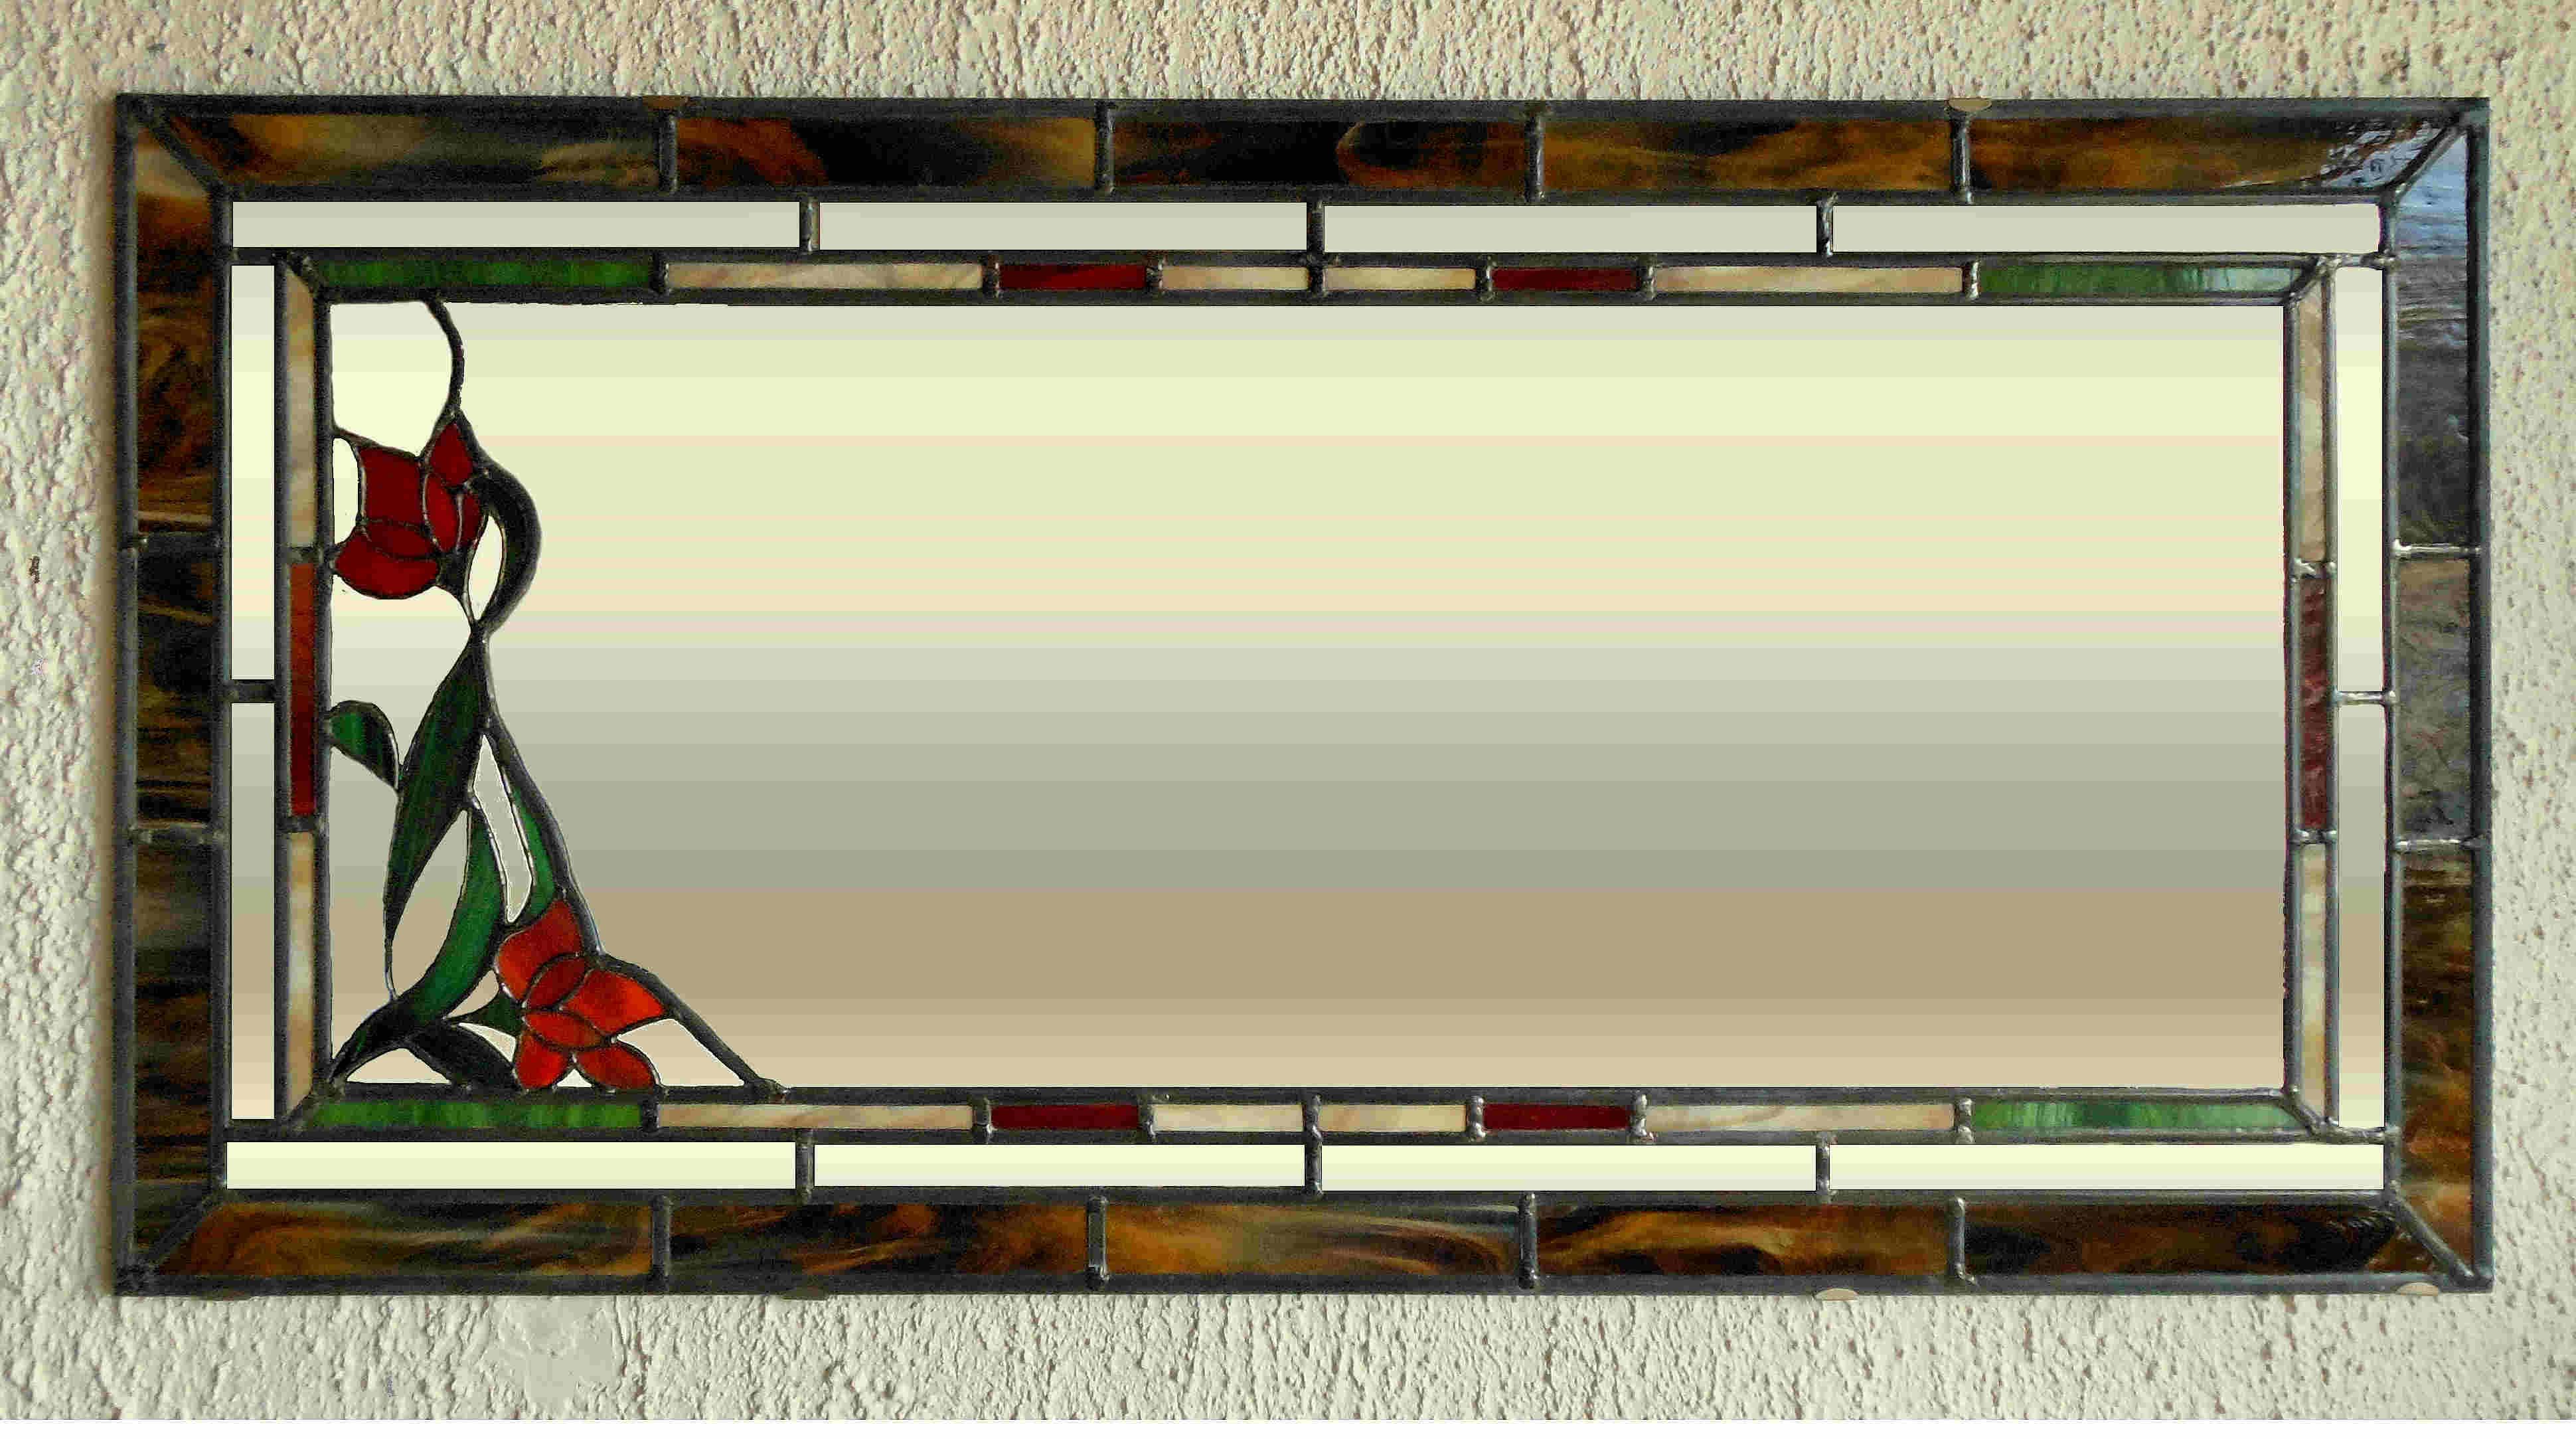 Glas in lood for Spiegel glas